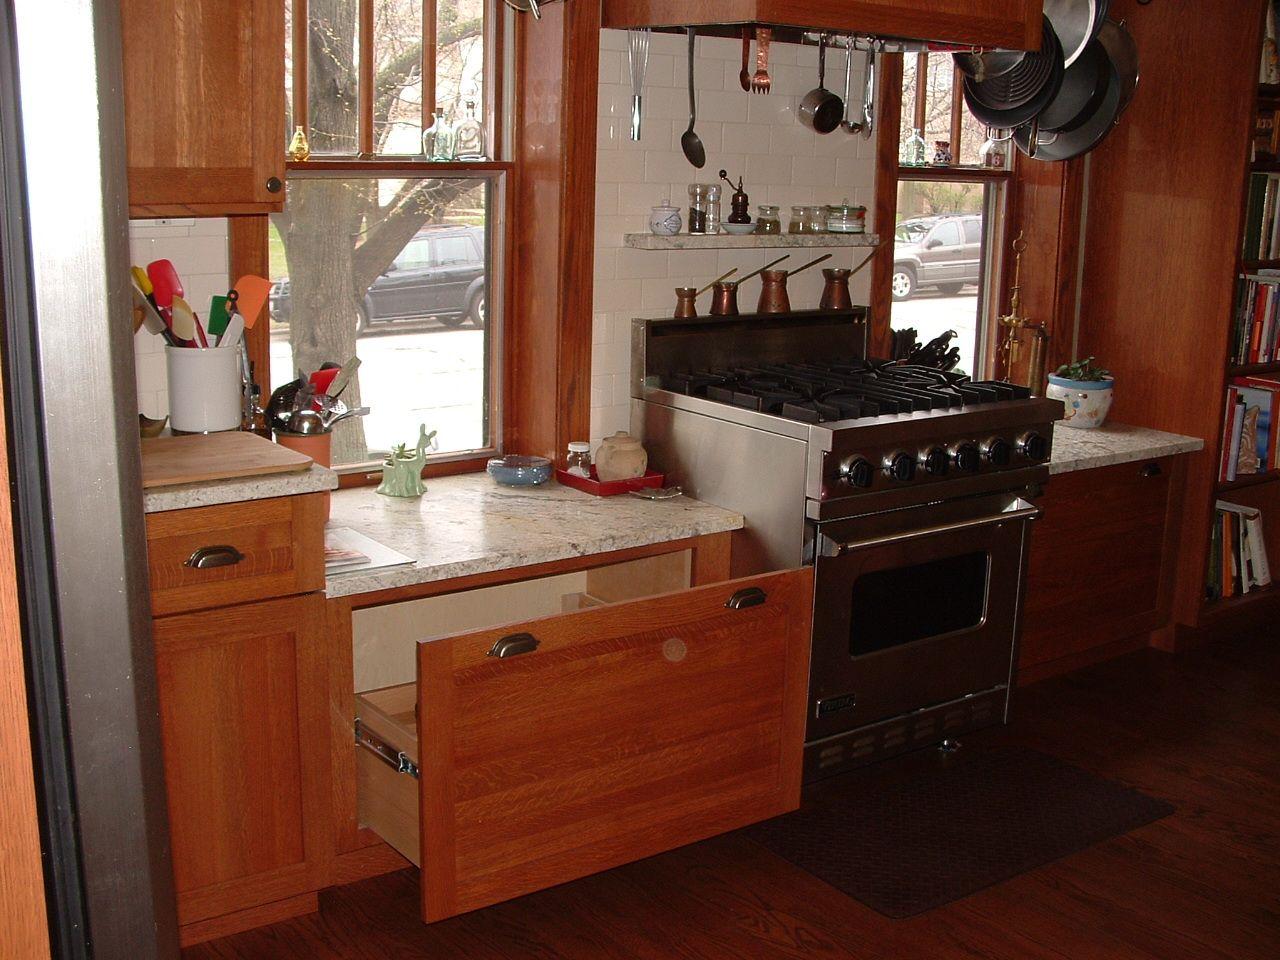 Low window behind kitchen sink  jim olsen olsendesign on pinterest